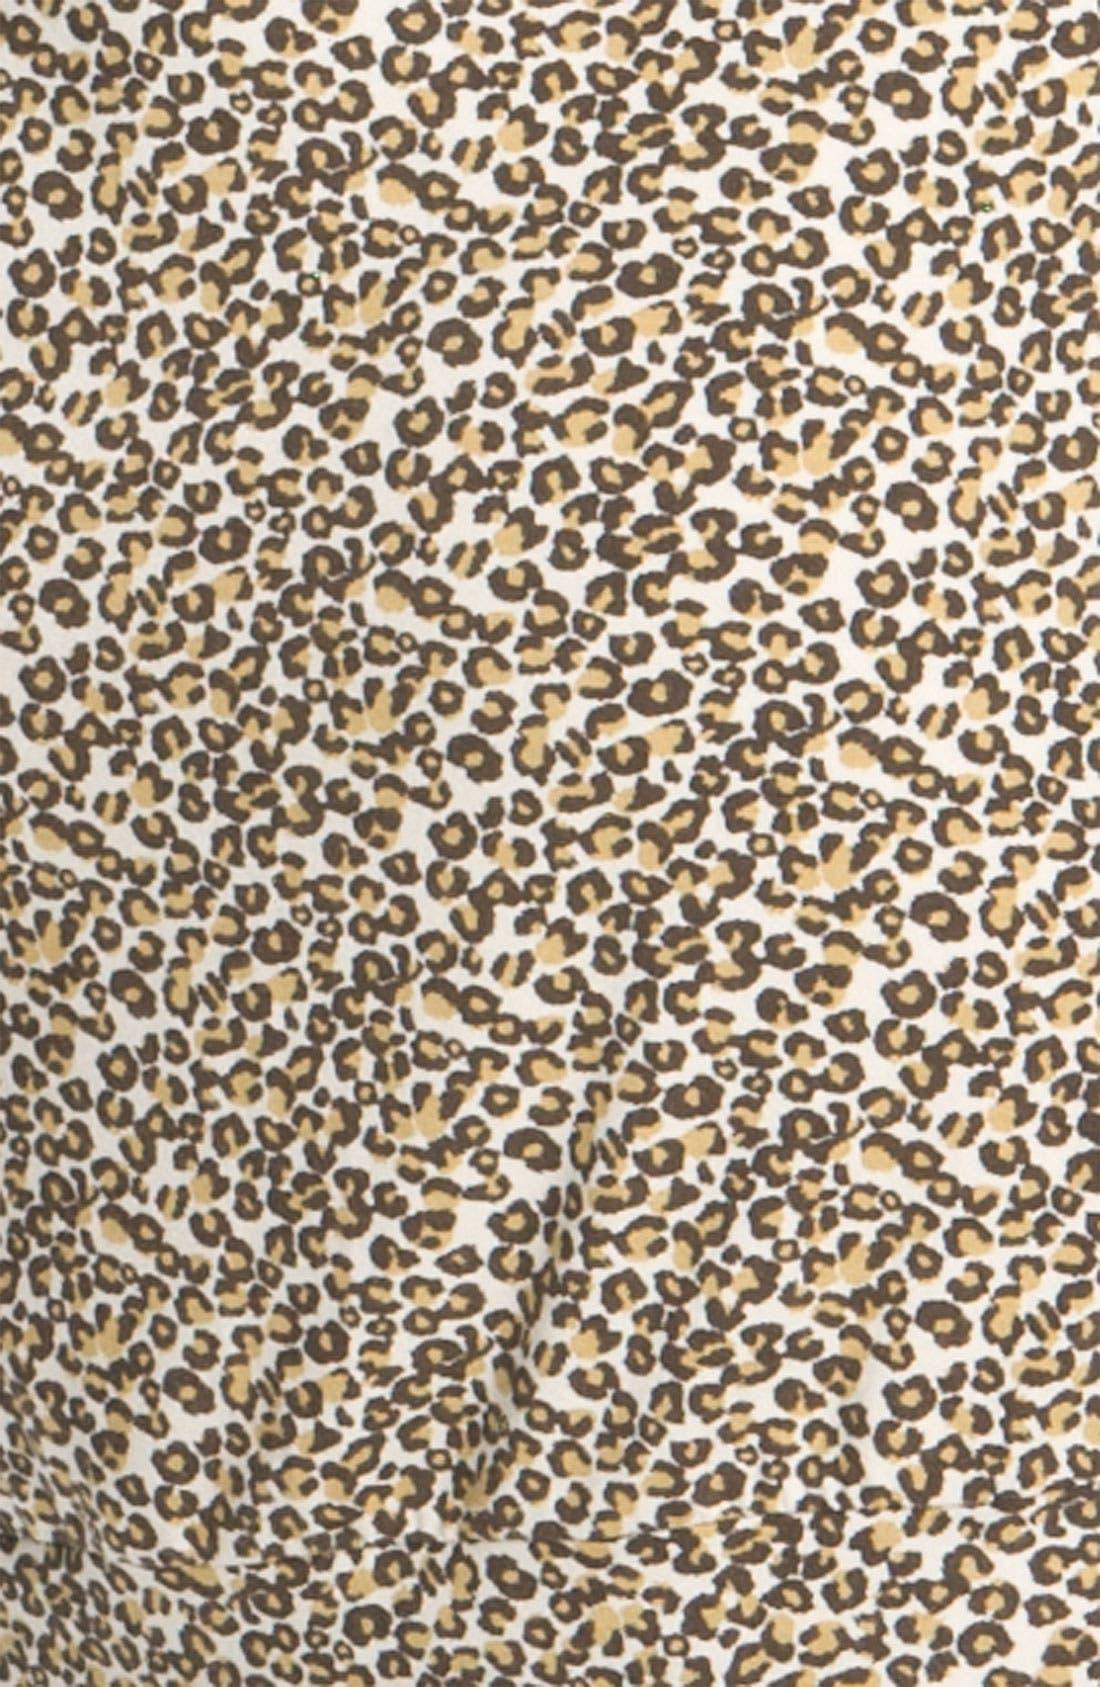 Leopard Print Turtleneck Dress,                             Alternate thumbnail 2, color,                             020